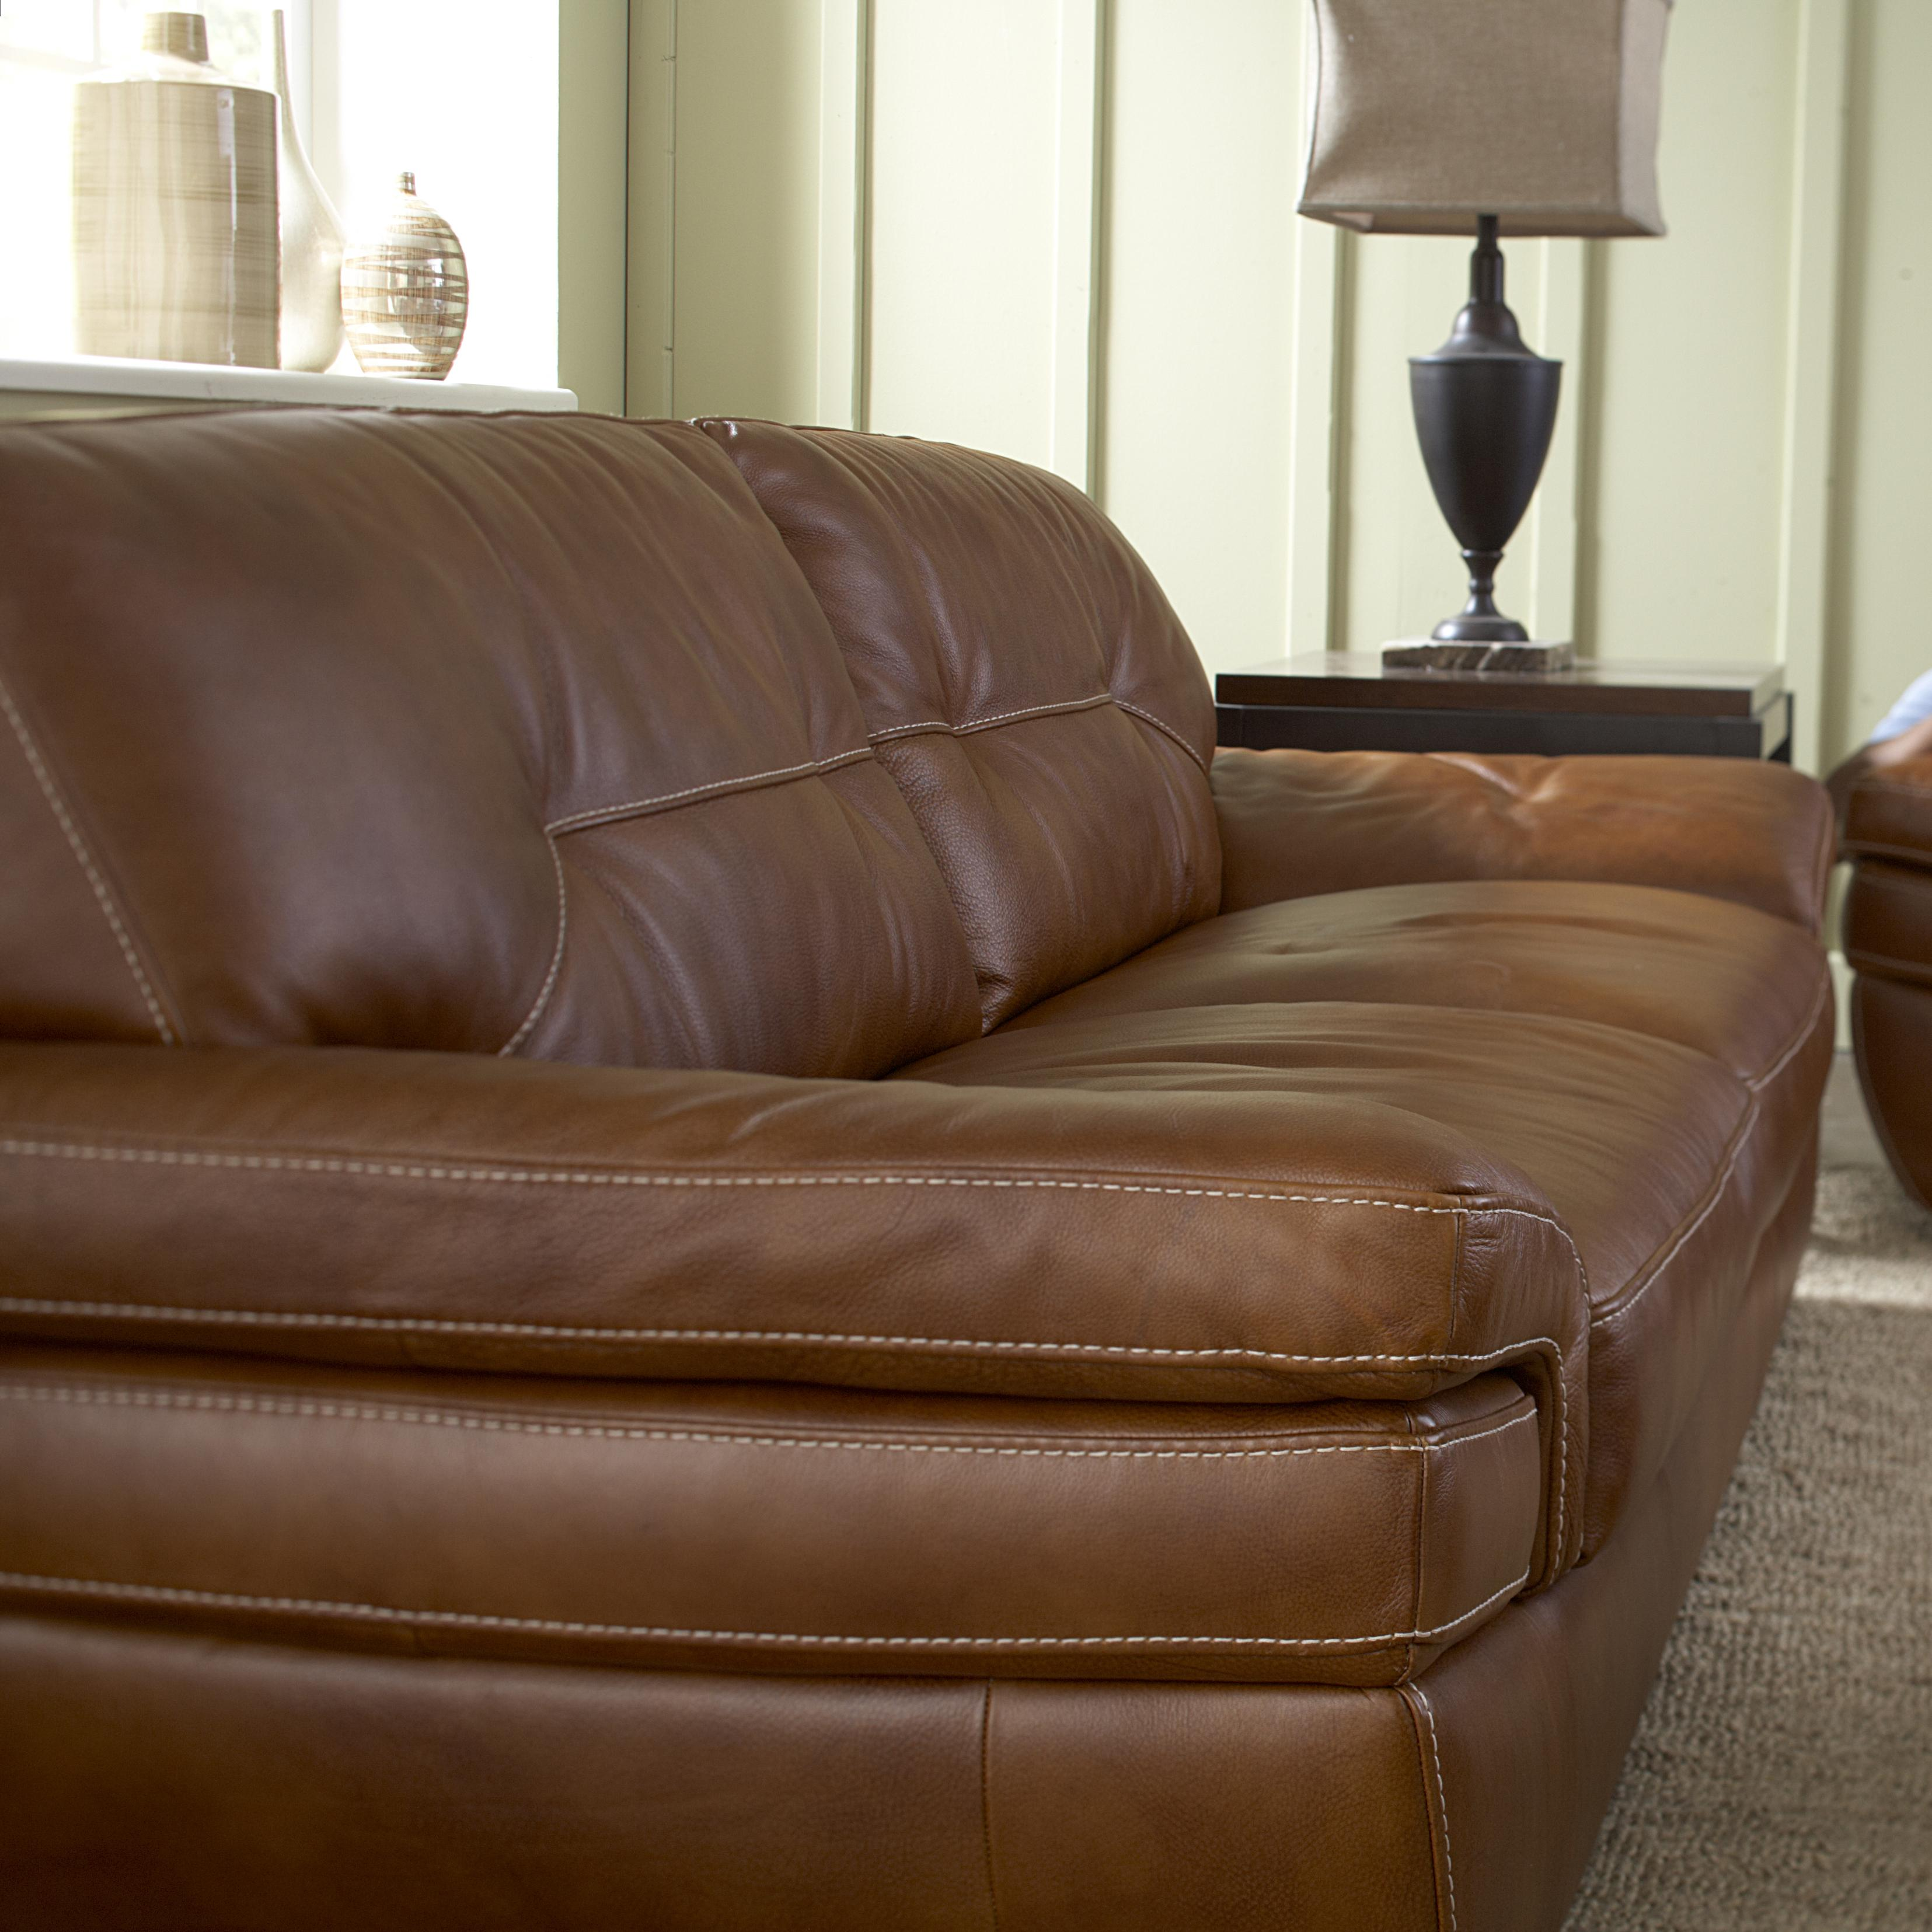 Natuzzi Editions B806 B806 009 Contemporary 2 Seat Sofa